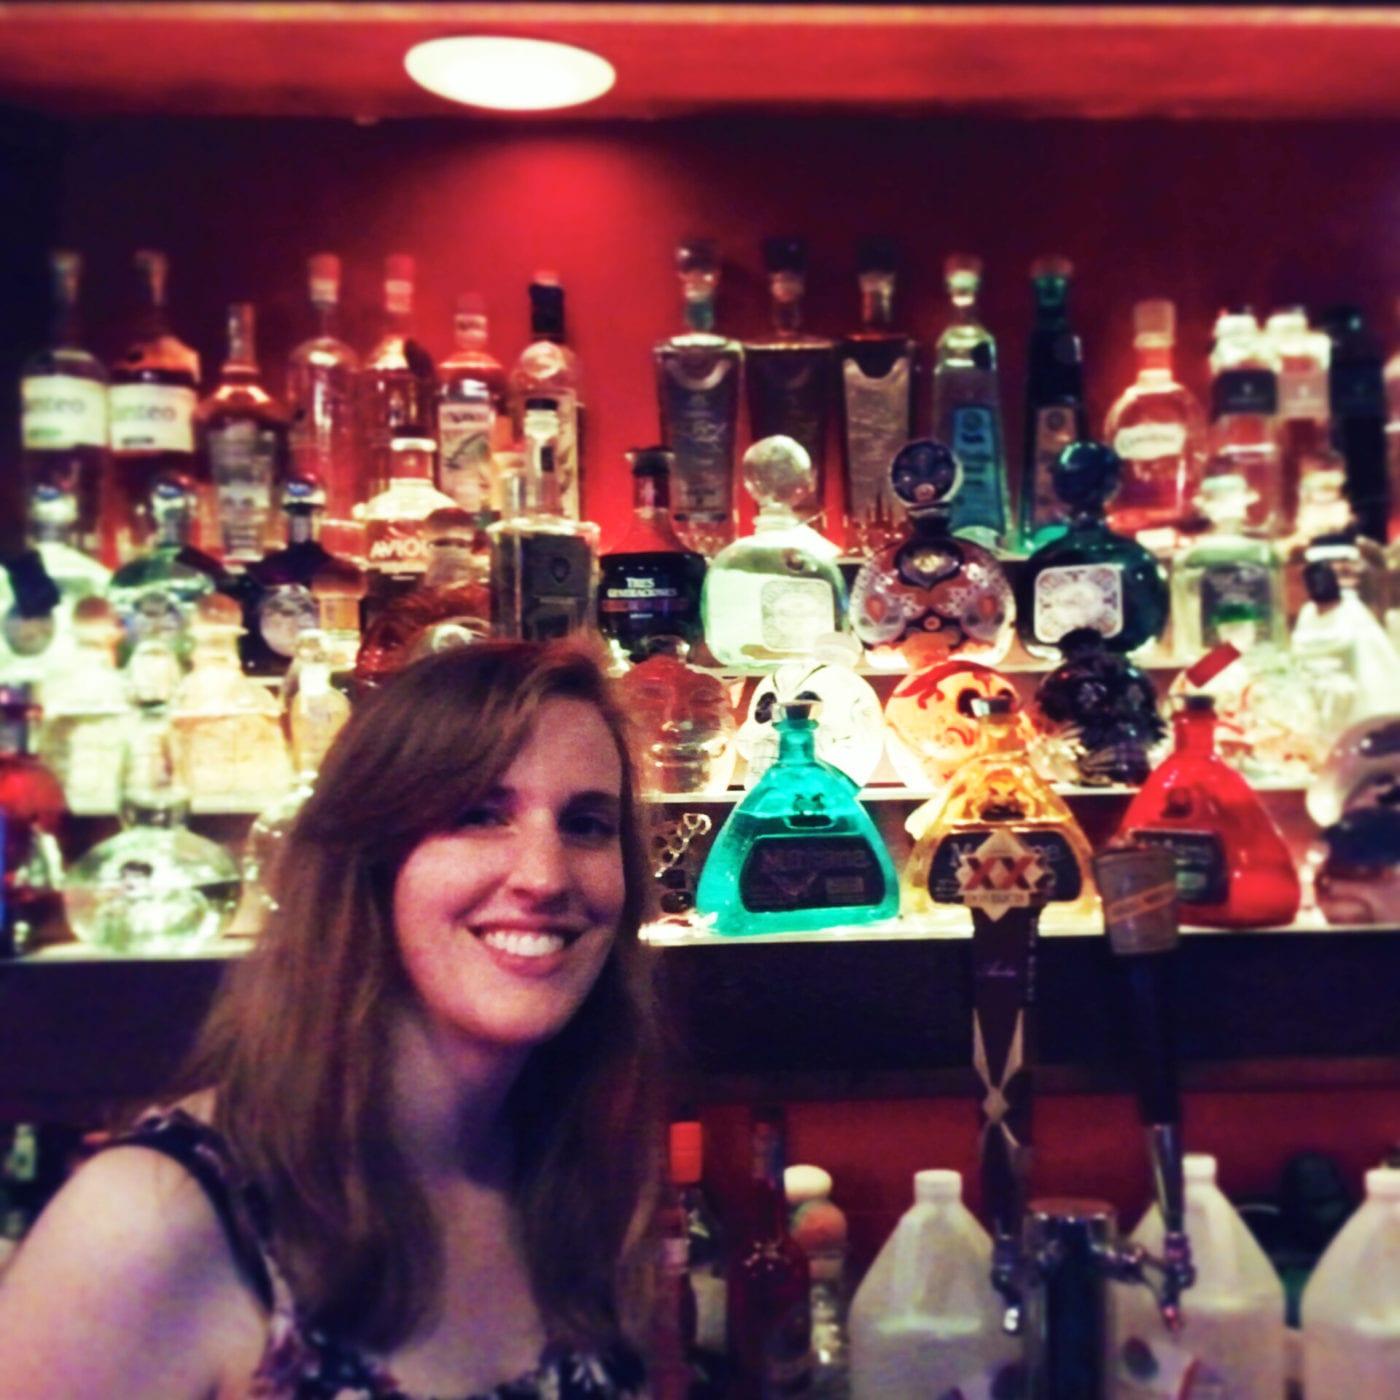 Tequila, Whatcom County spirits, Jalapenos, Bellingham, Margaritas, best Mexican food